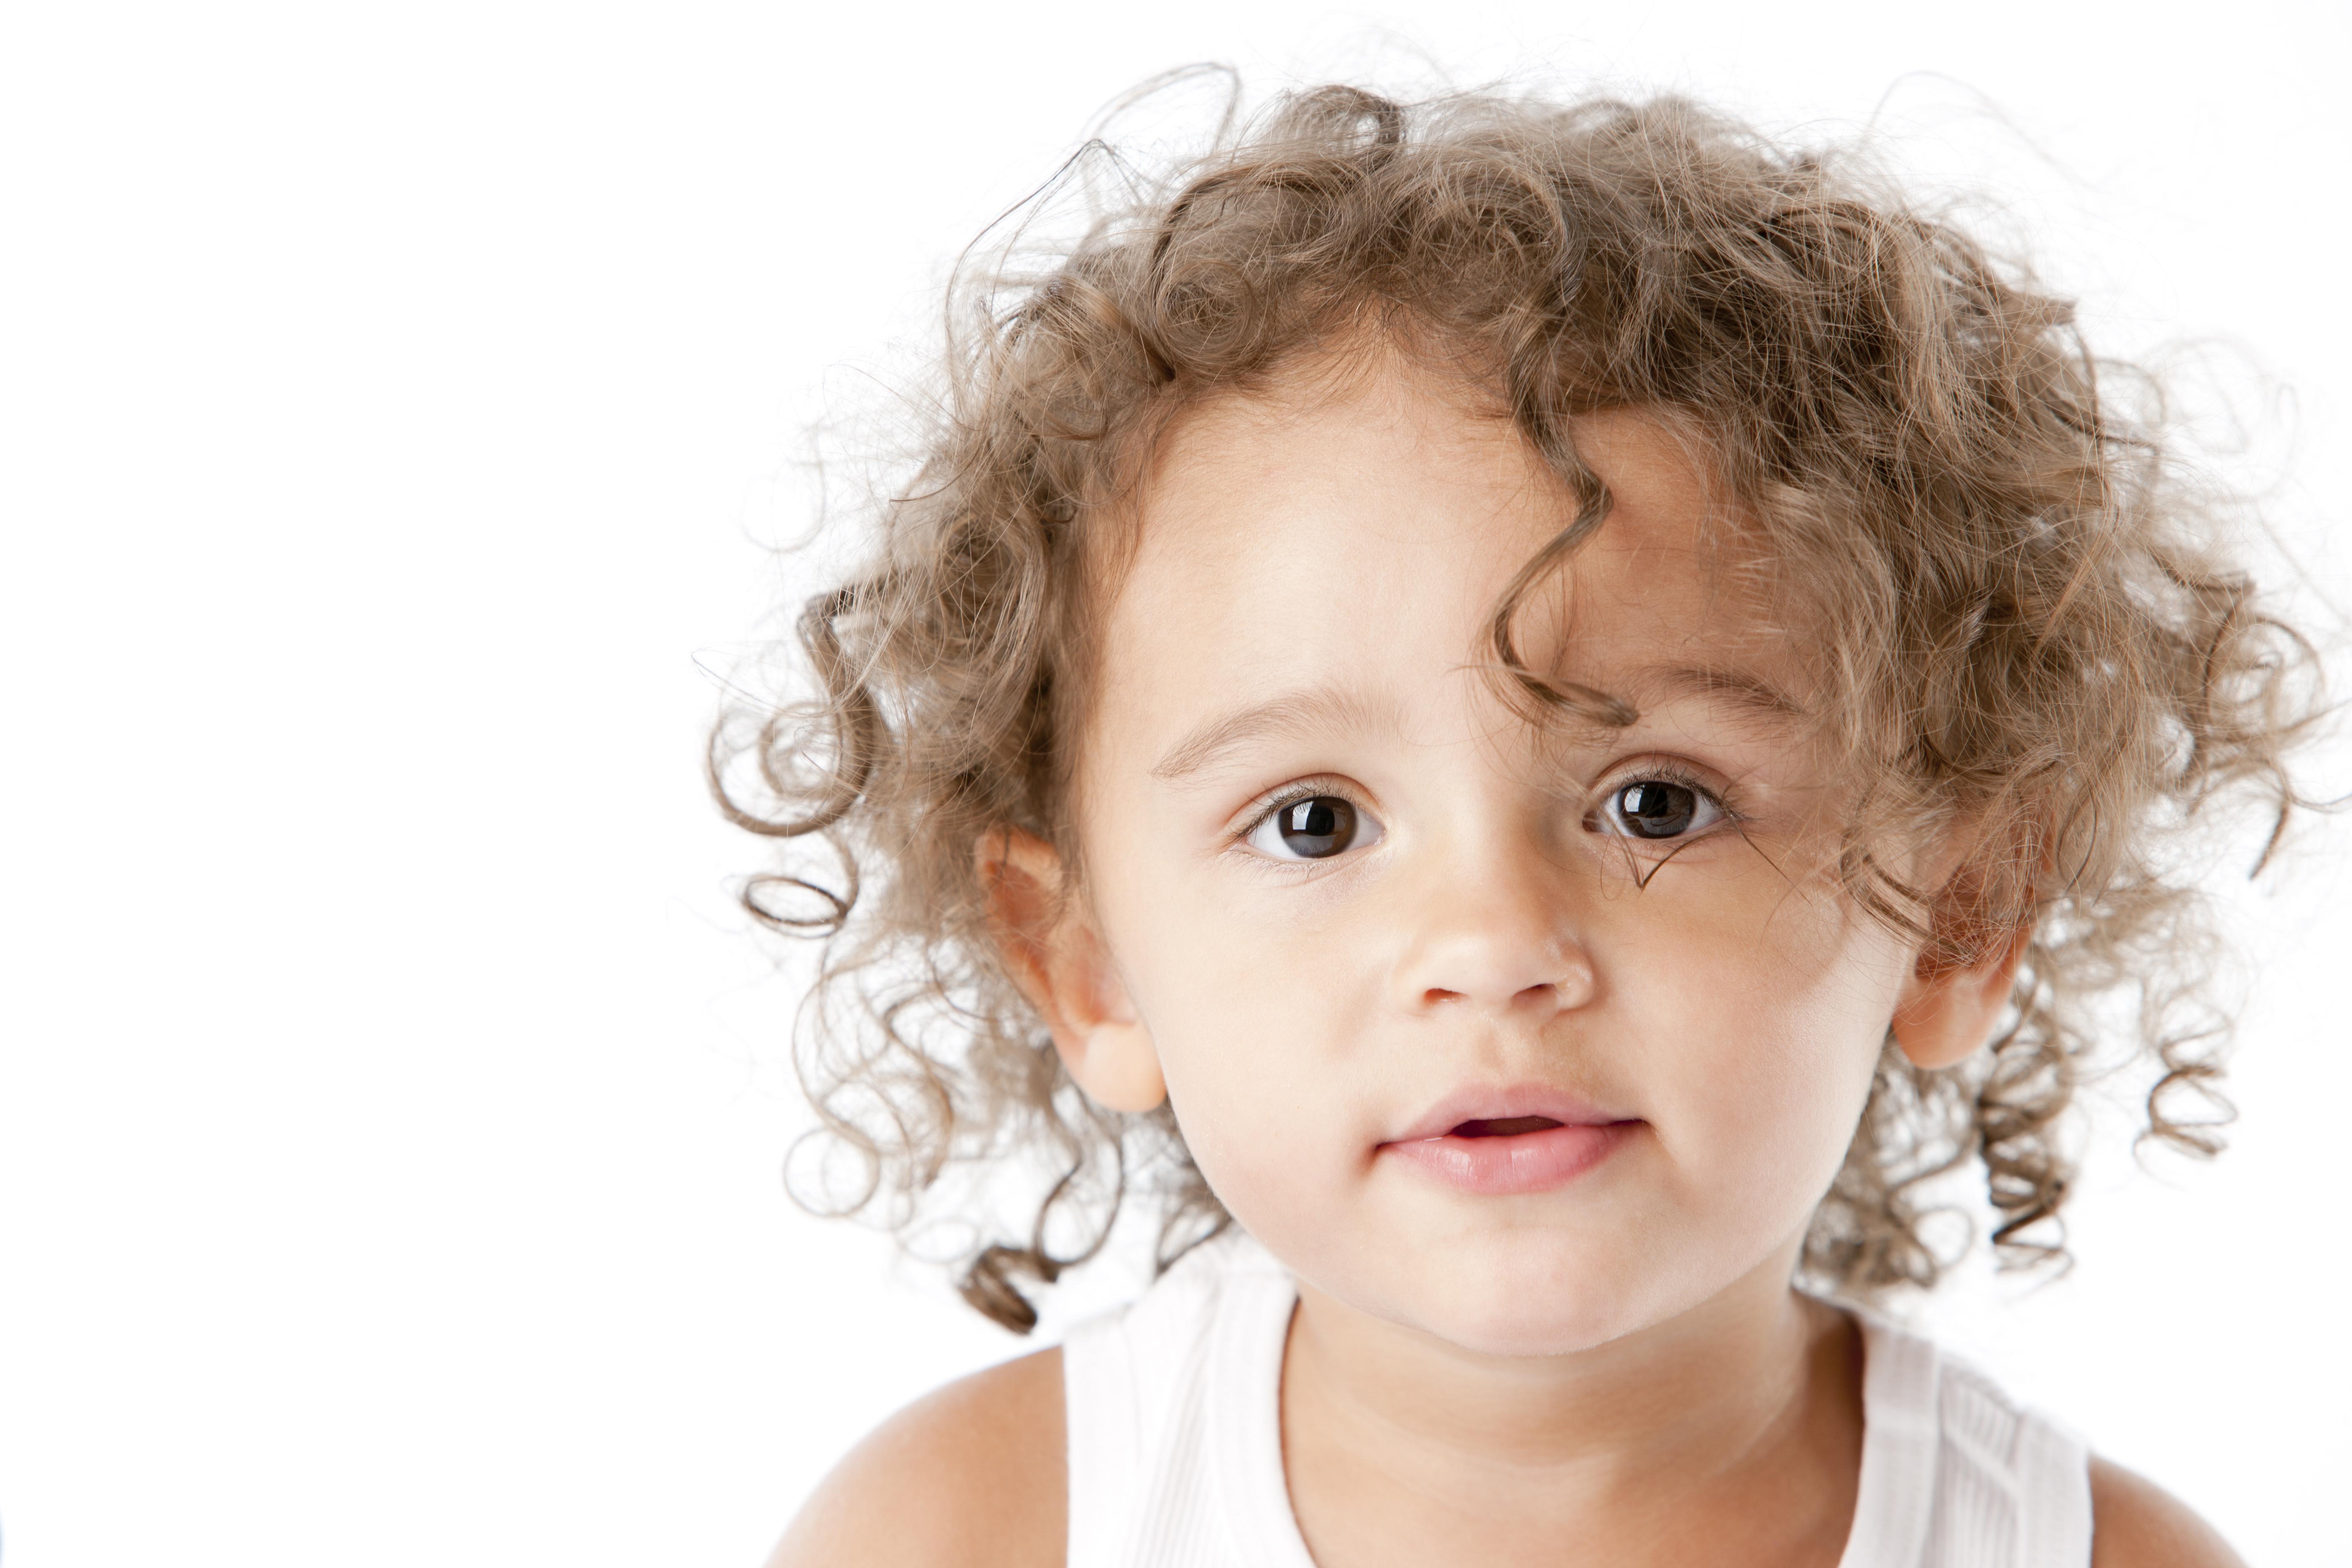 Синева носогубного треугольника у ребенка фото